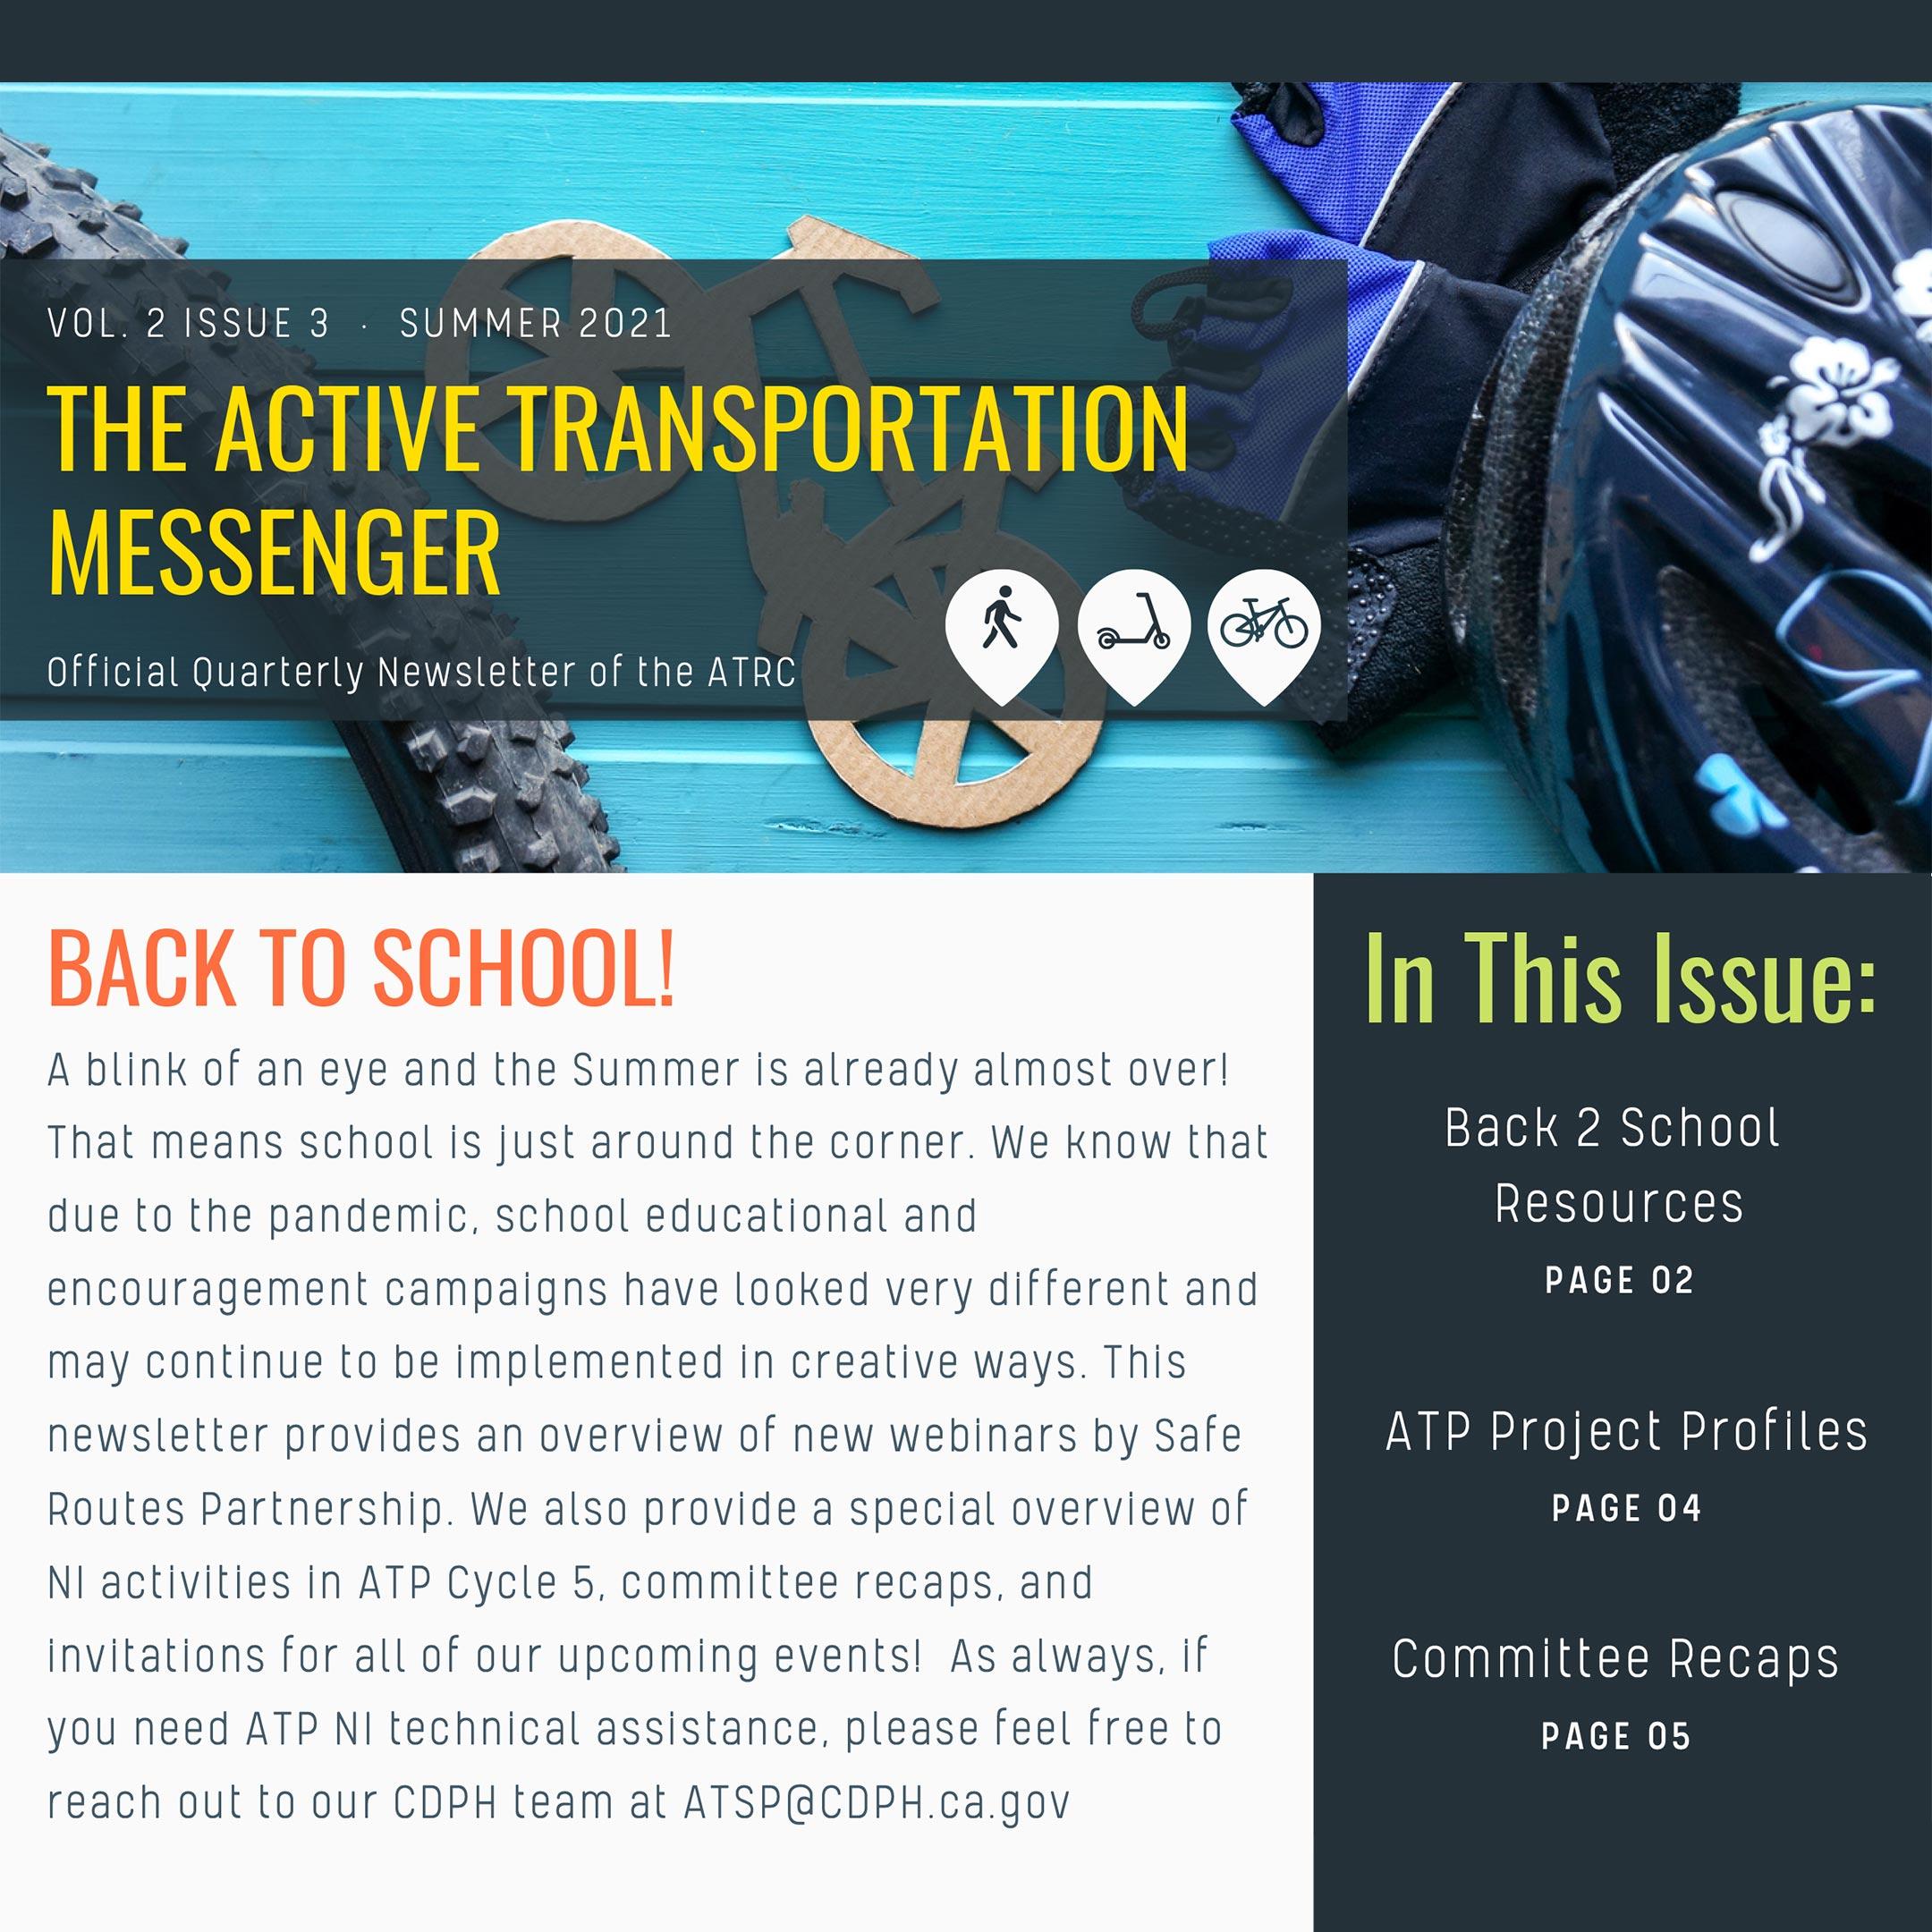 ATRC Newsletter